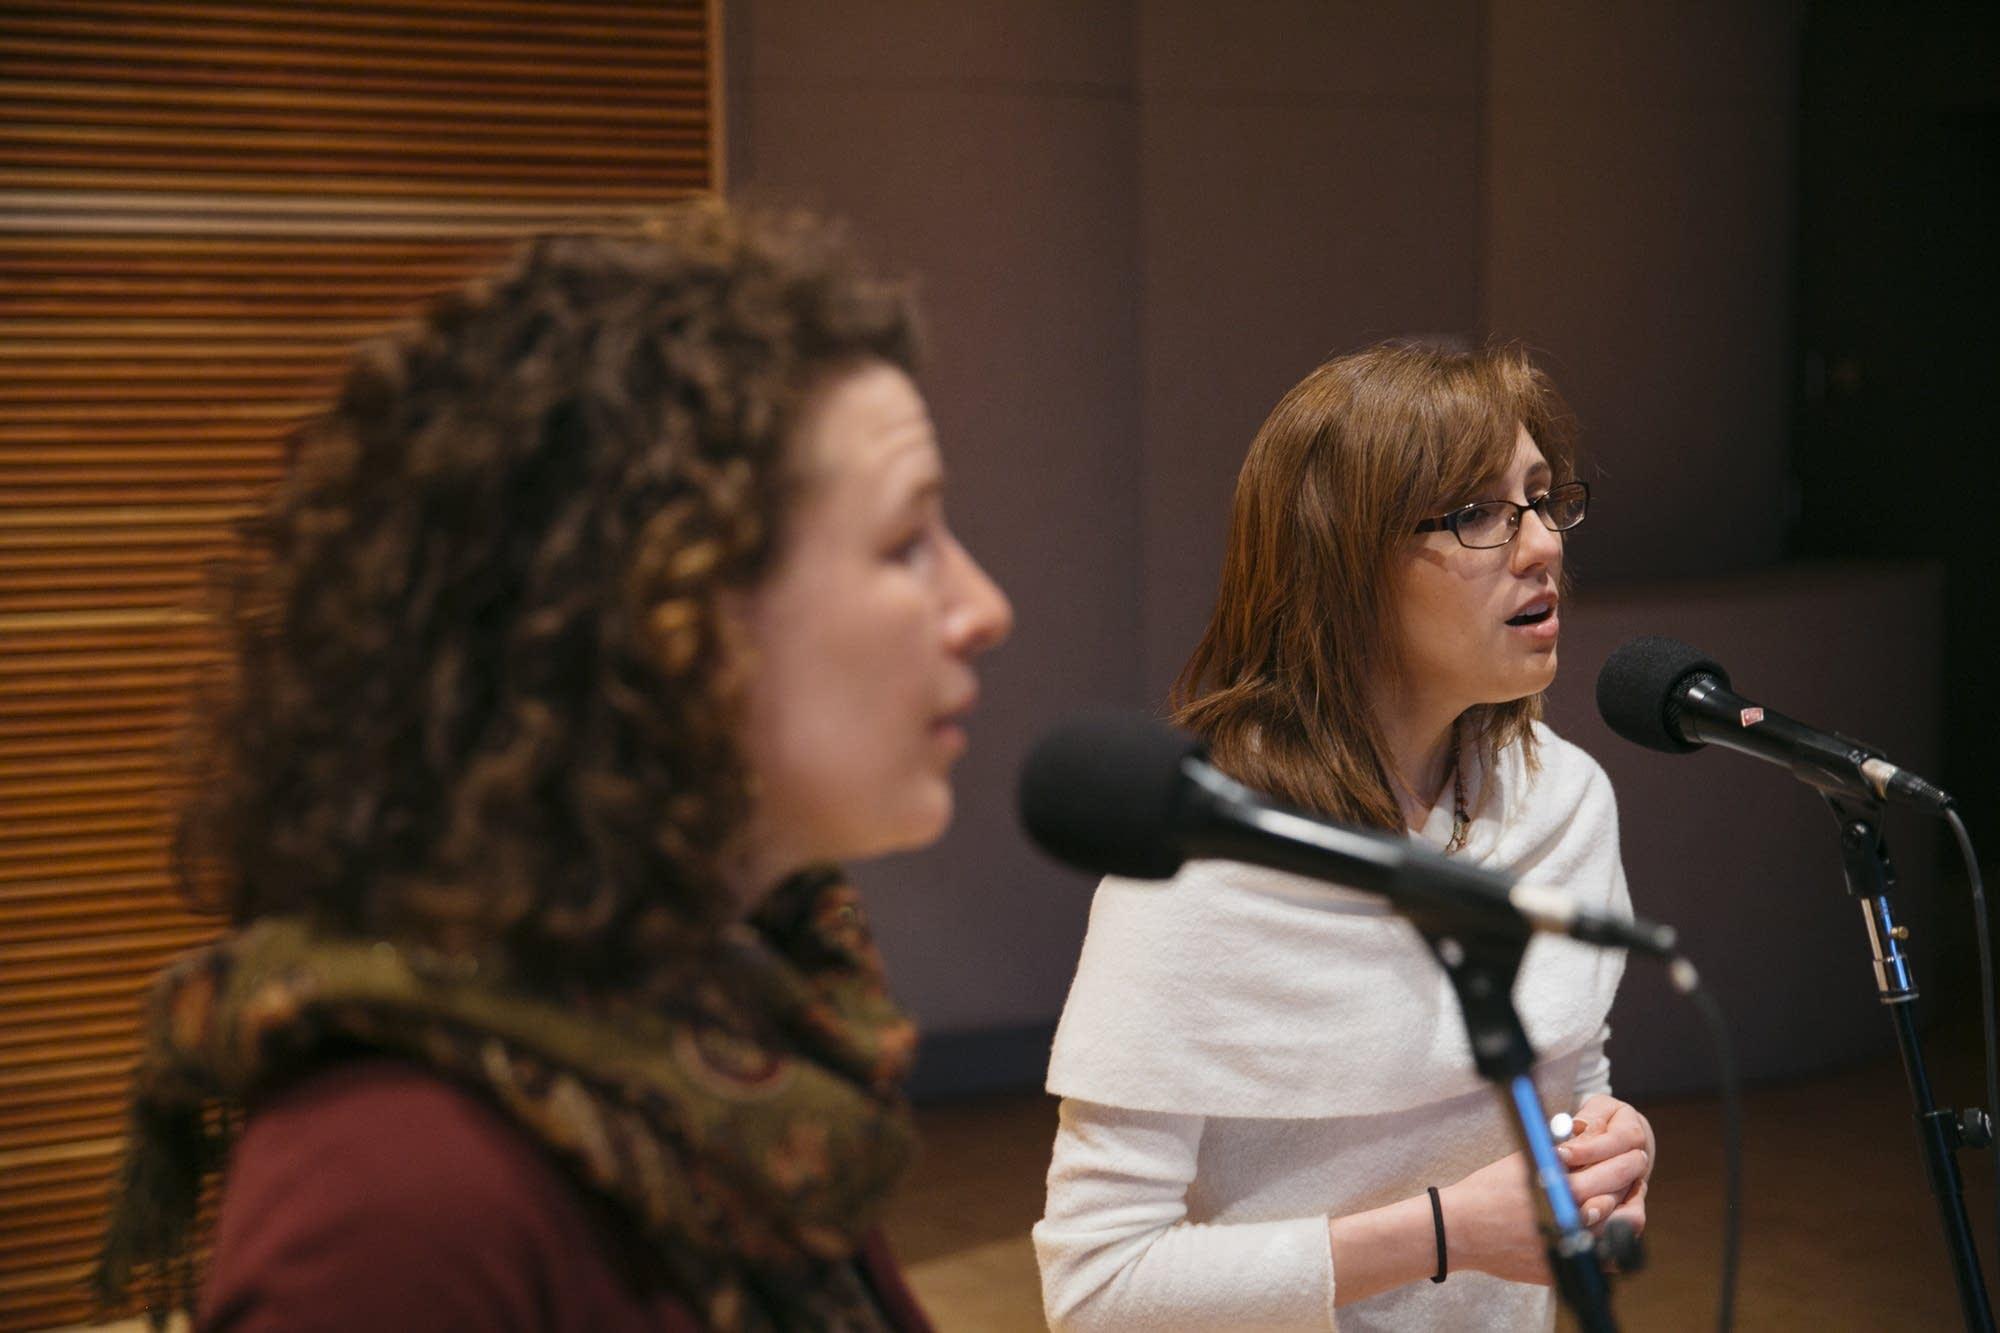 Rachel LaViola sings alongside Sarah Larsson in the Nightingale Trio